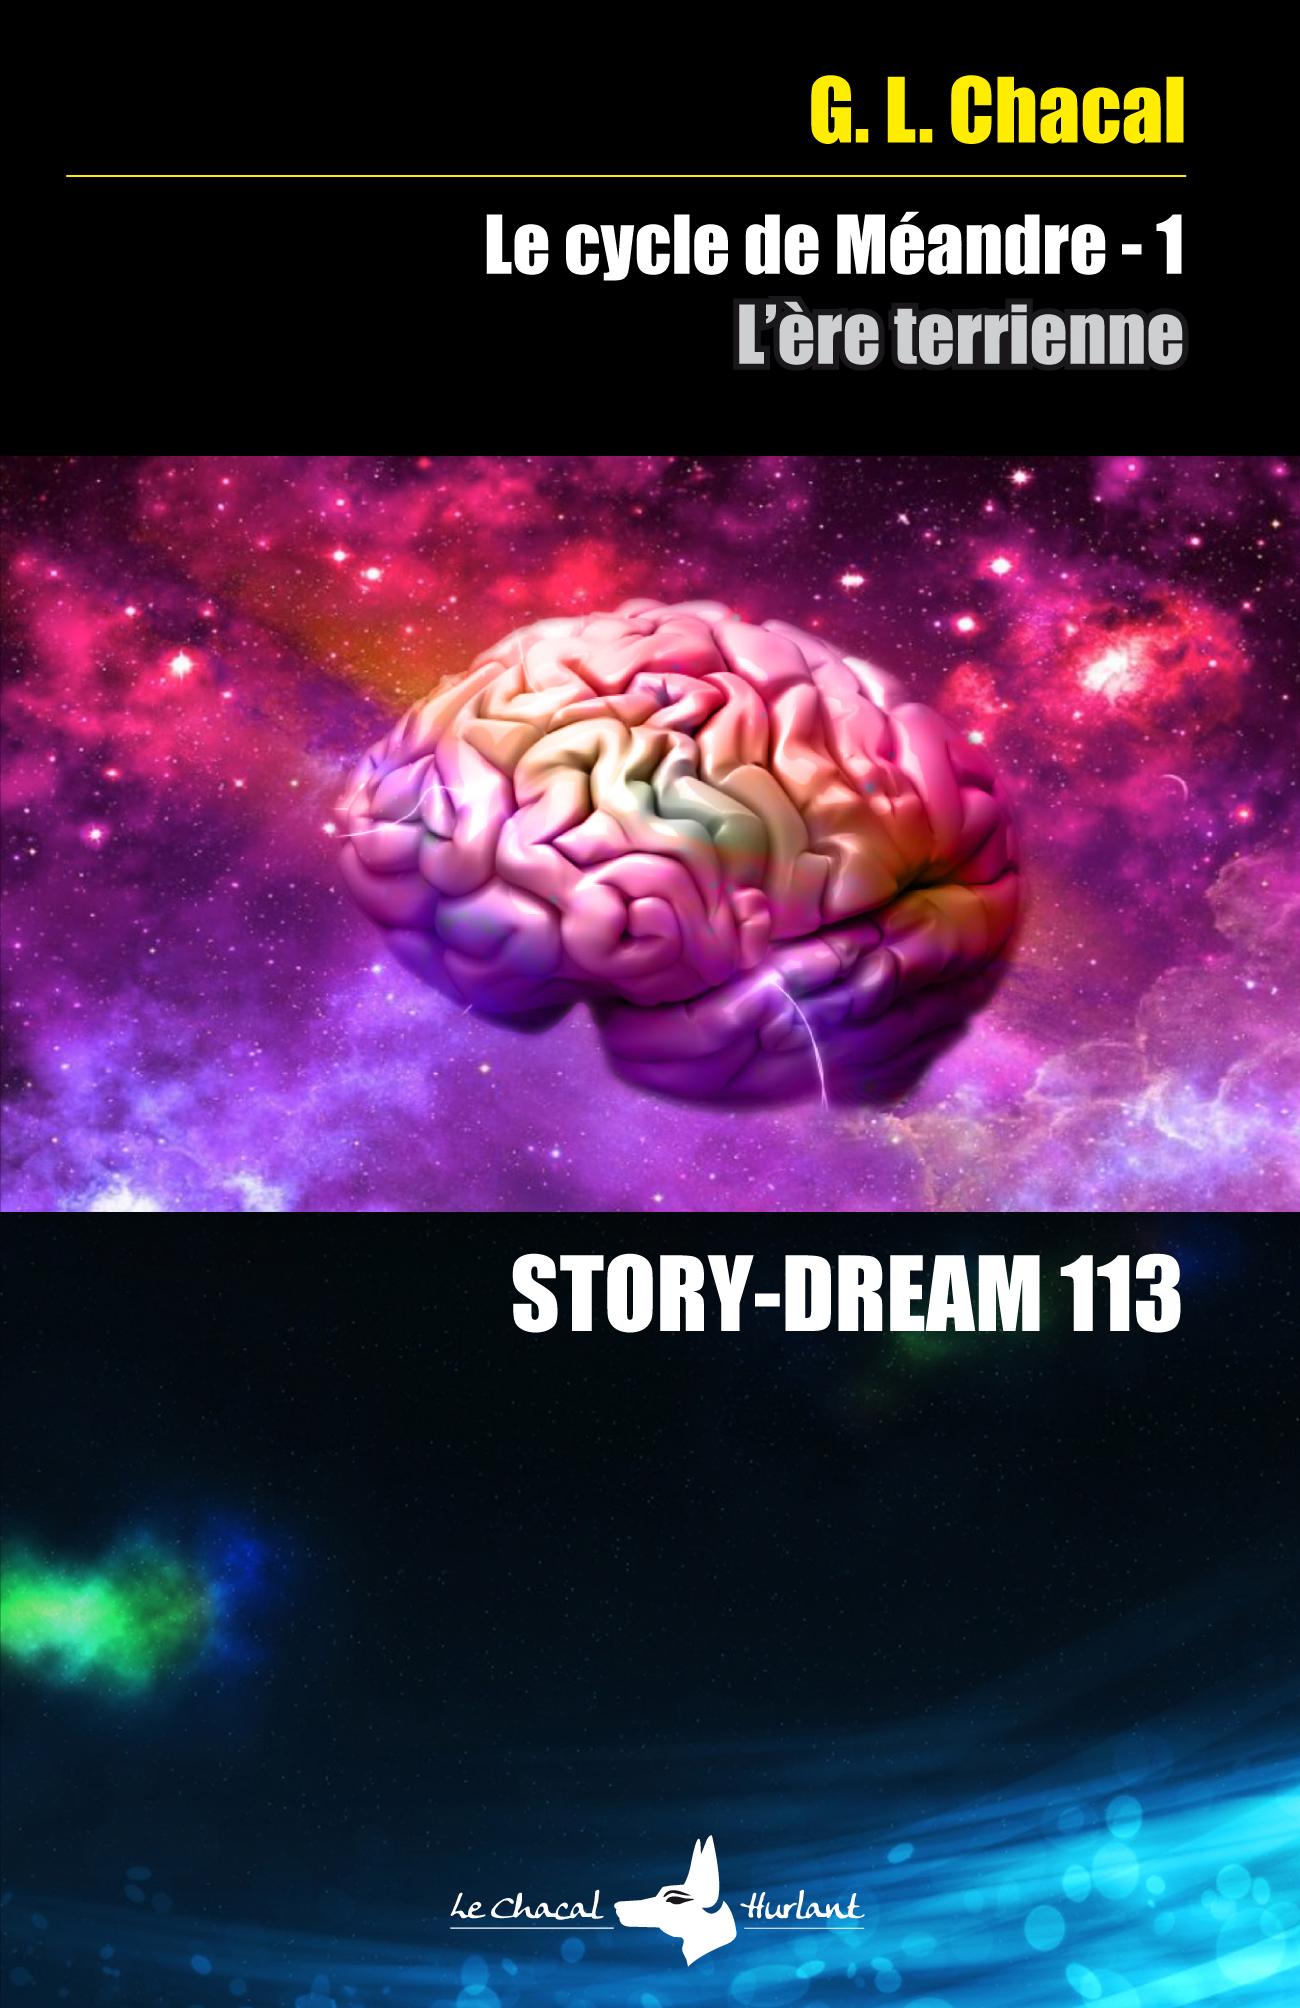 STORY DREAM 113